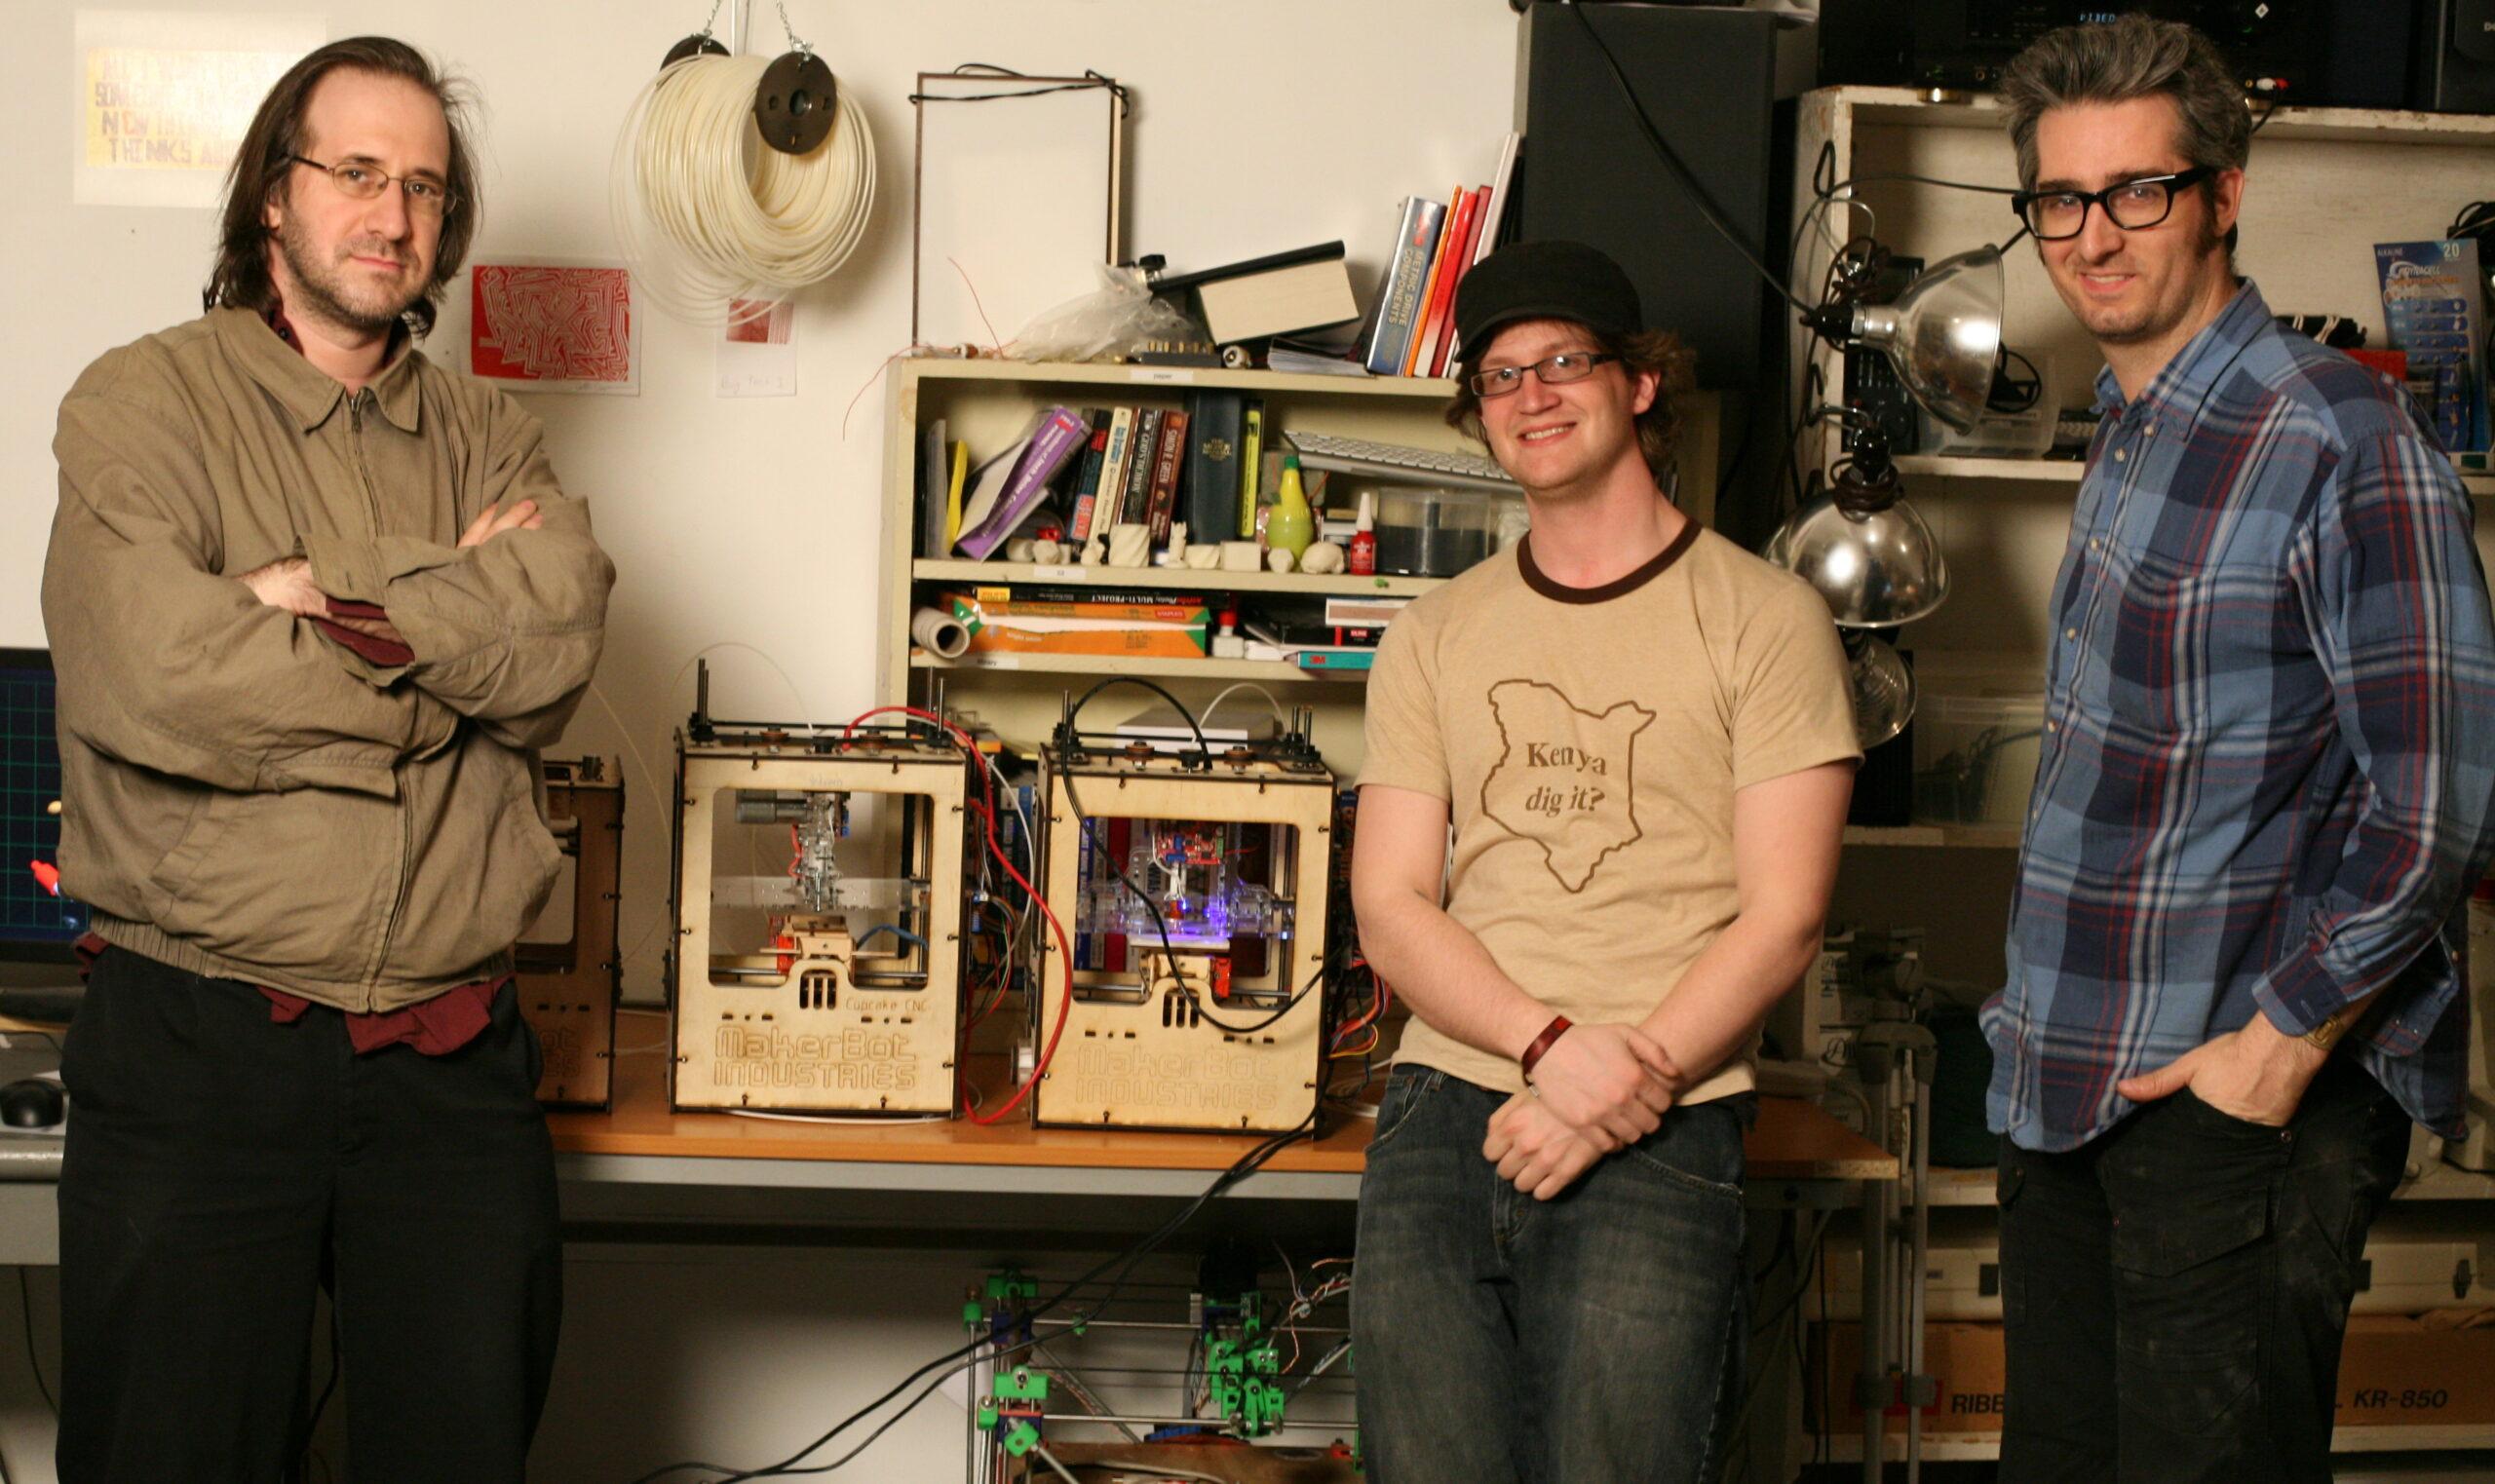 اعضای تیم MakerBot